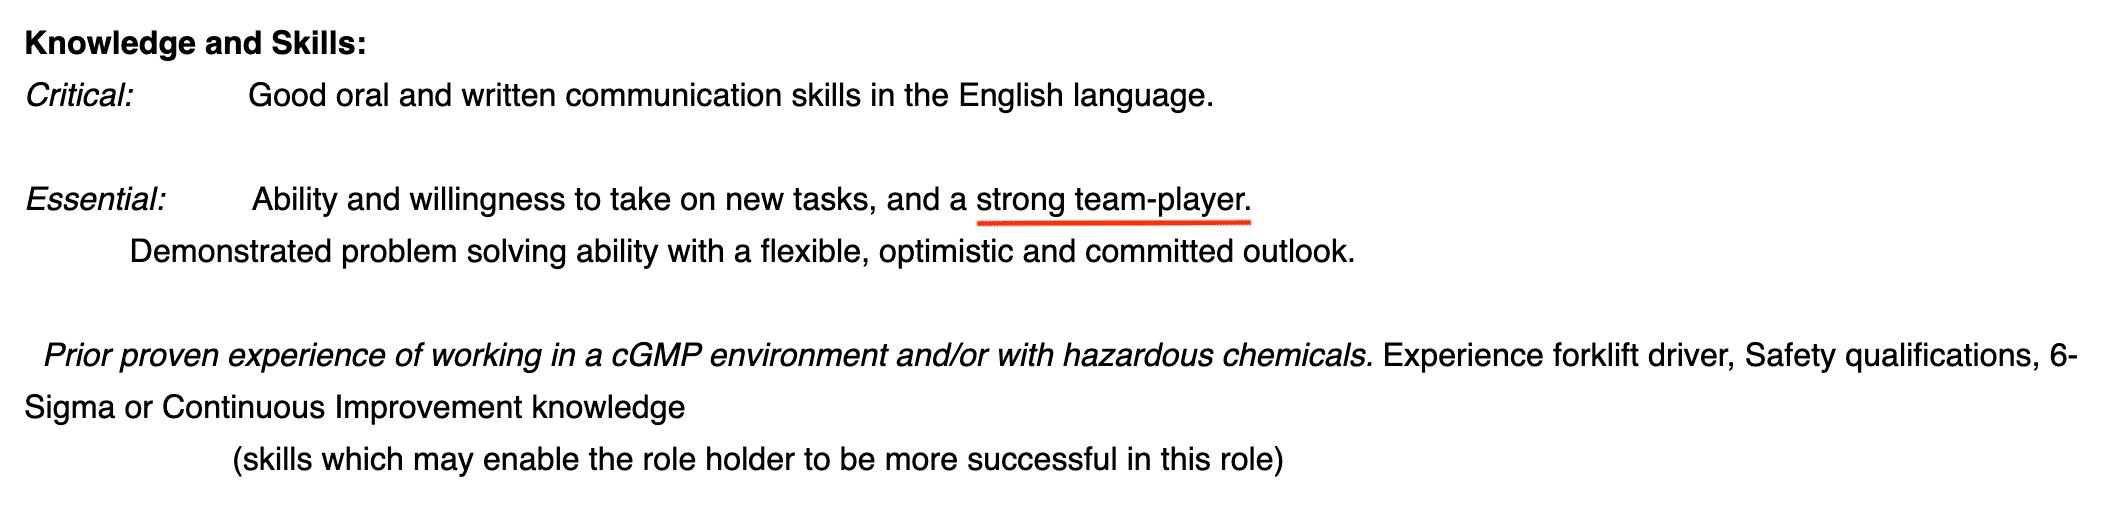 Example pharma job advert